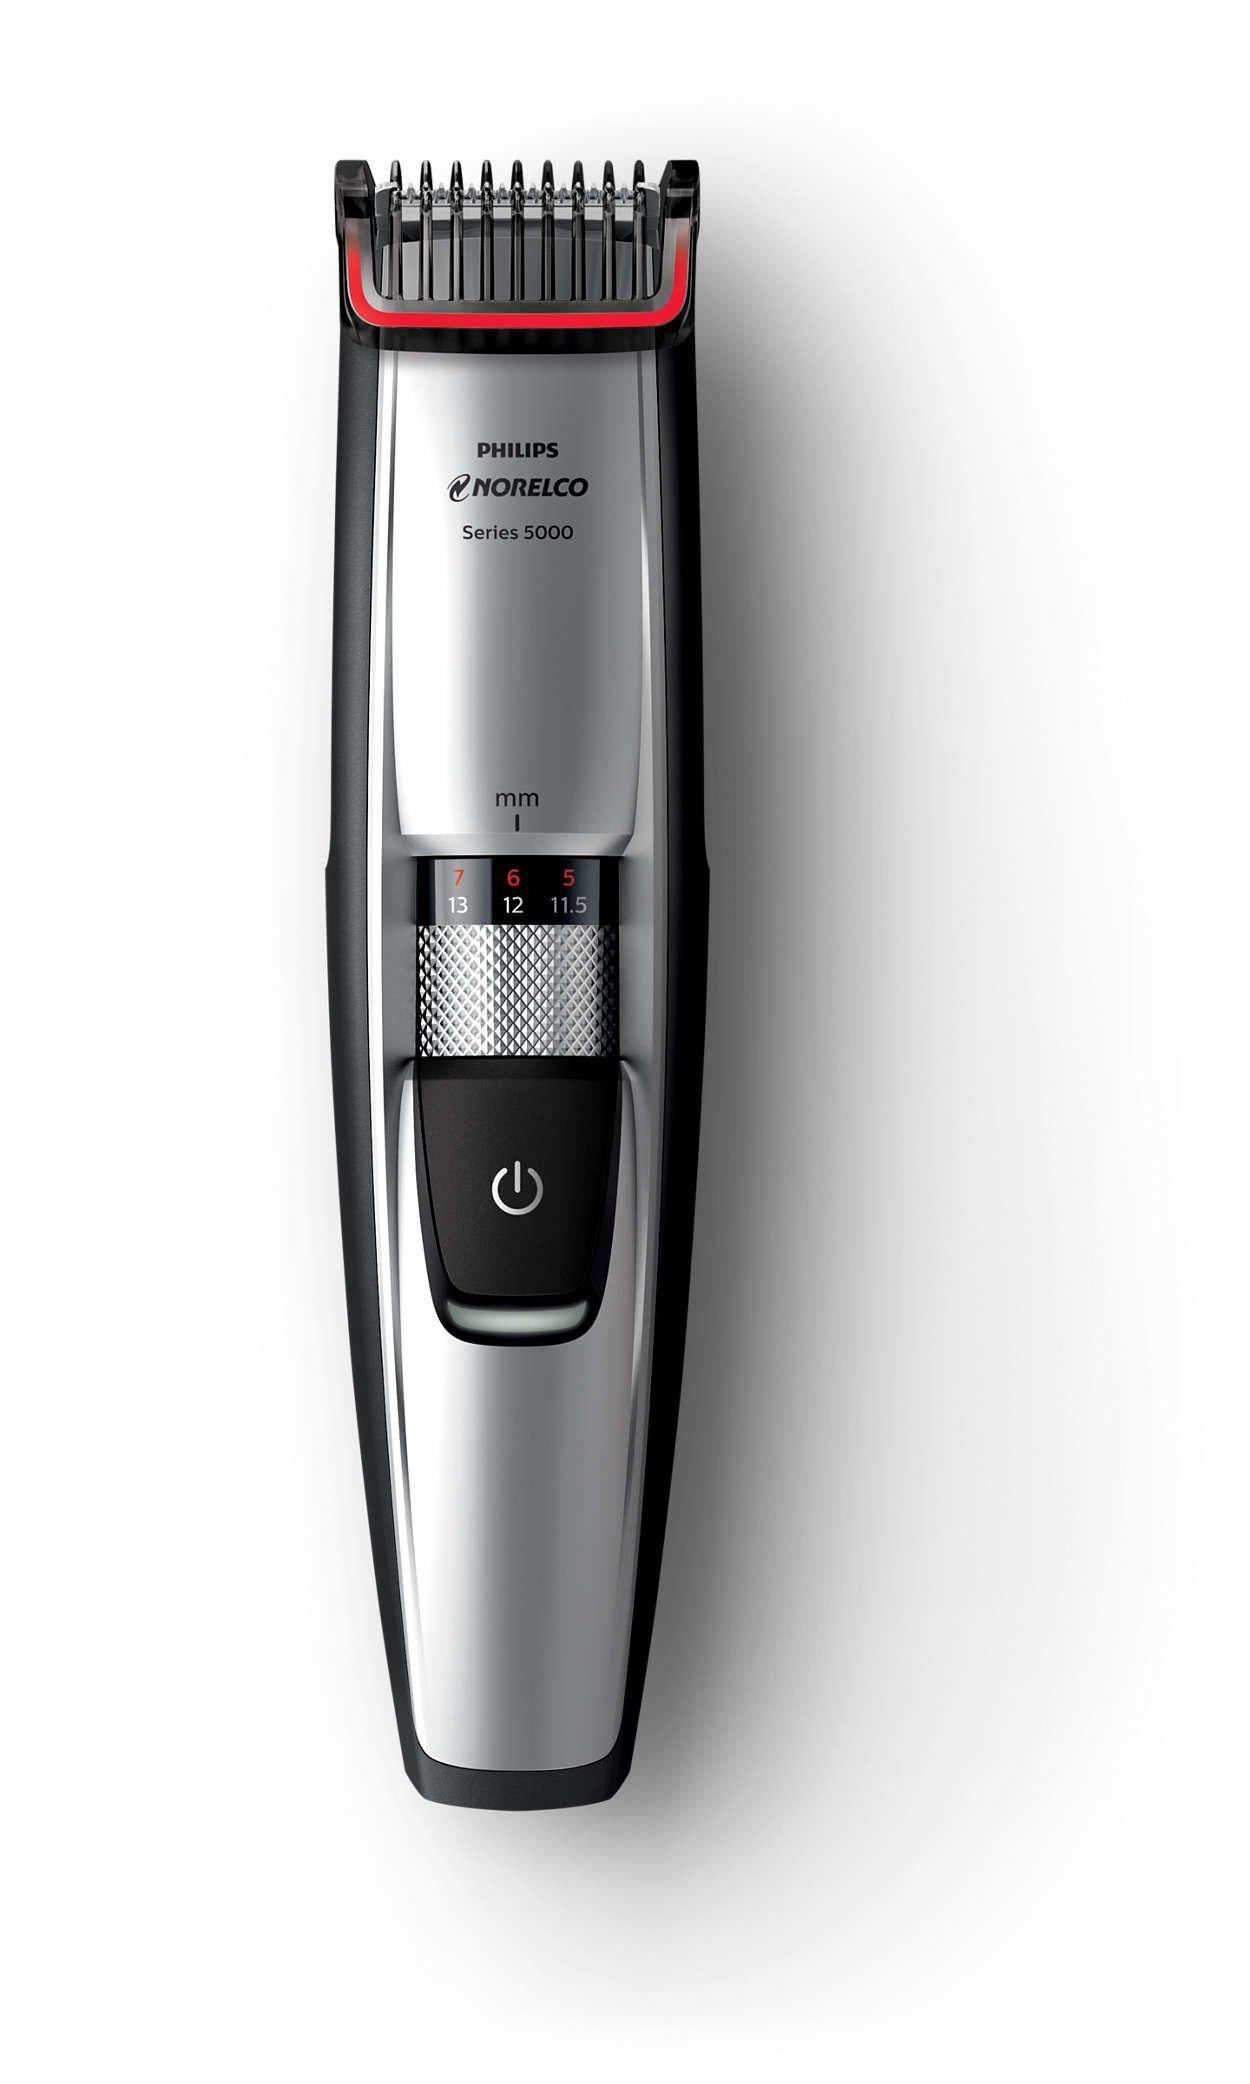 Philips Norelco Cordless Multigroom Turbo Powered